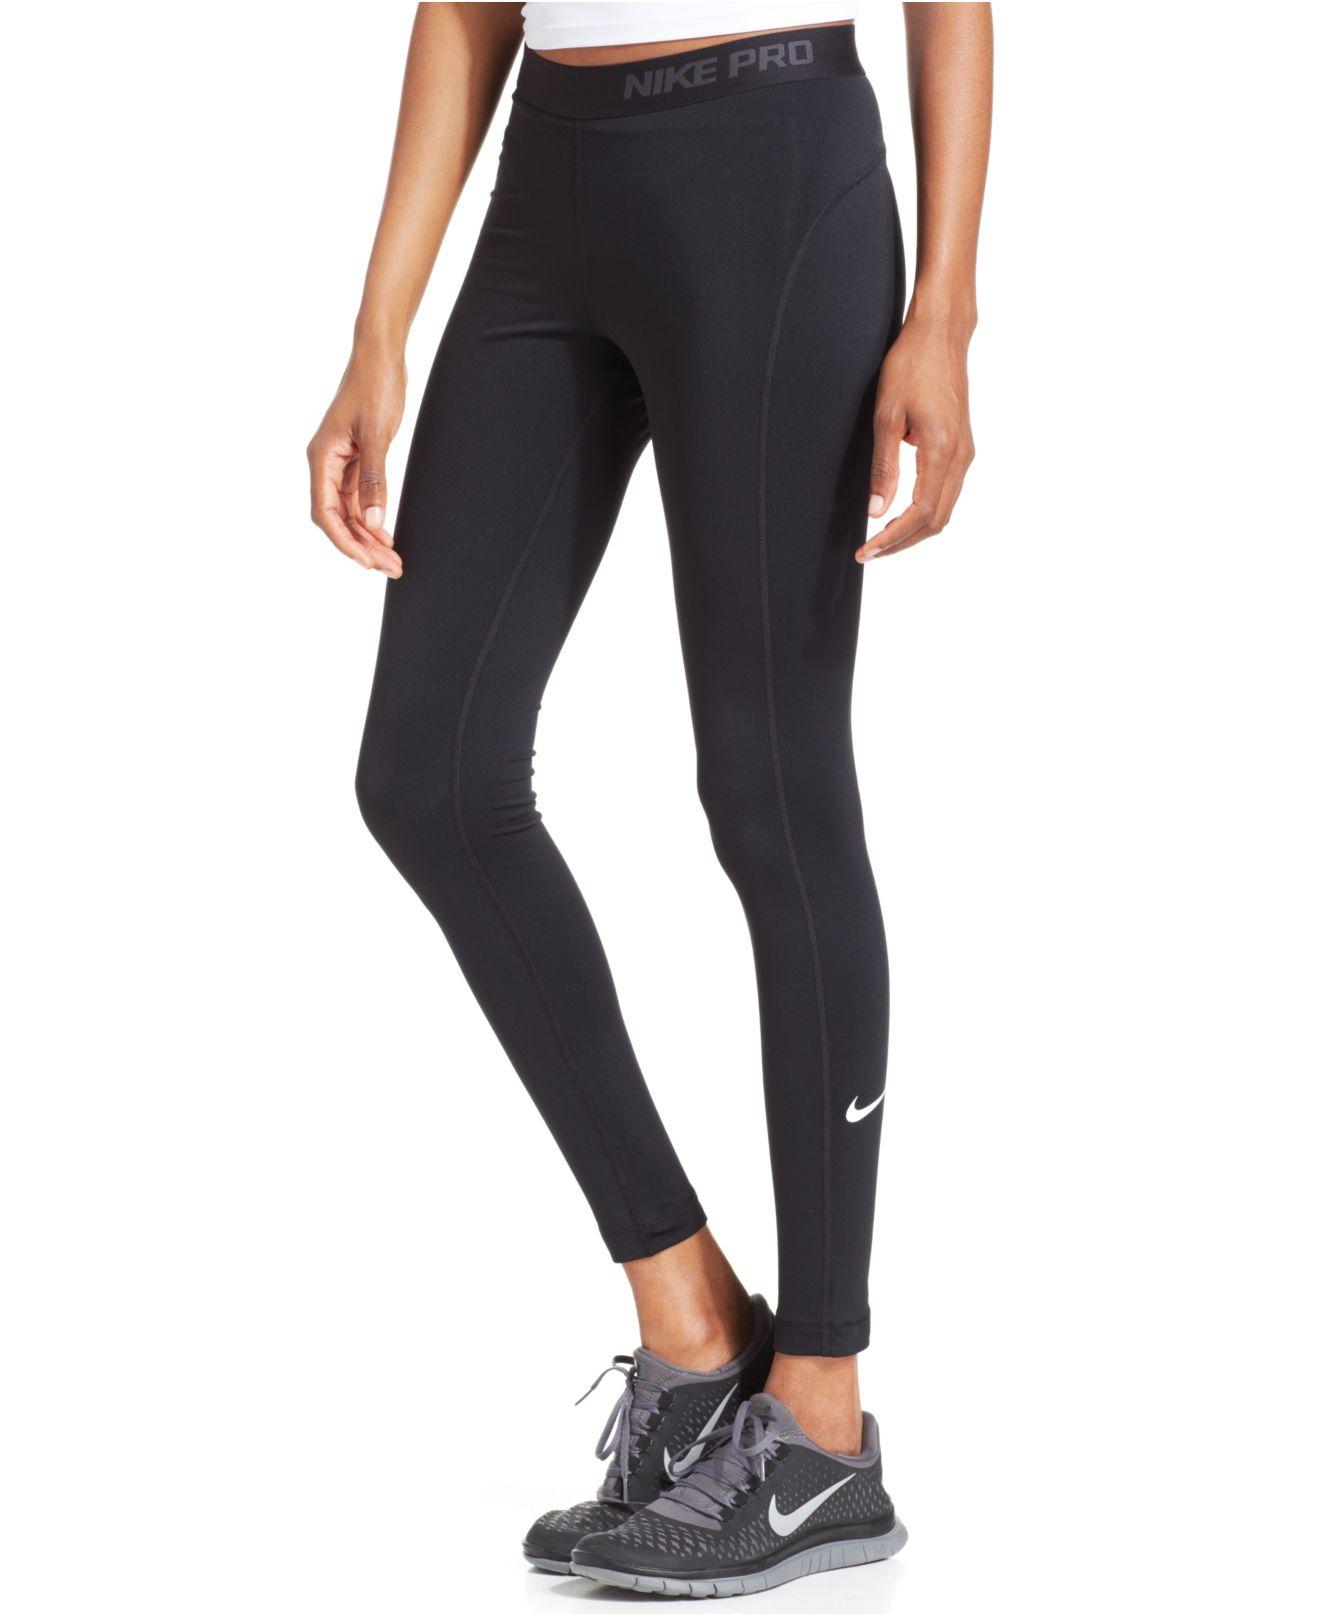 Lyst - Nike Pro Hyperwarm 3.0 Dri-Fit Leggings in Black 0fdc7d73b